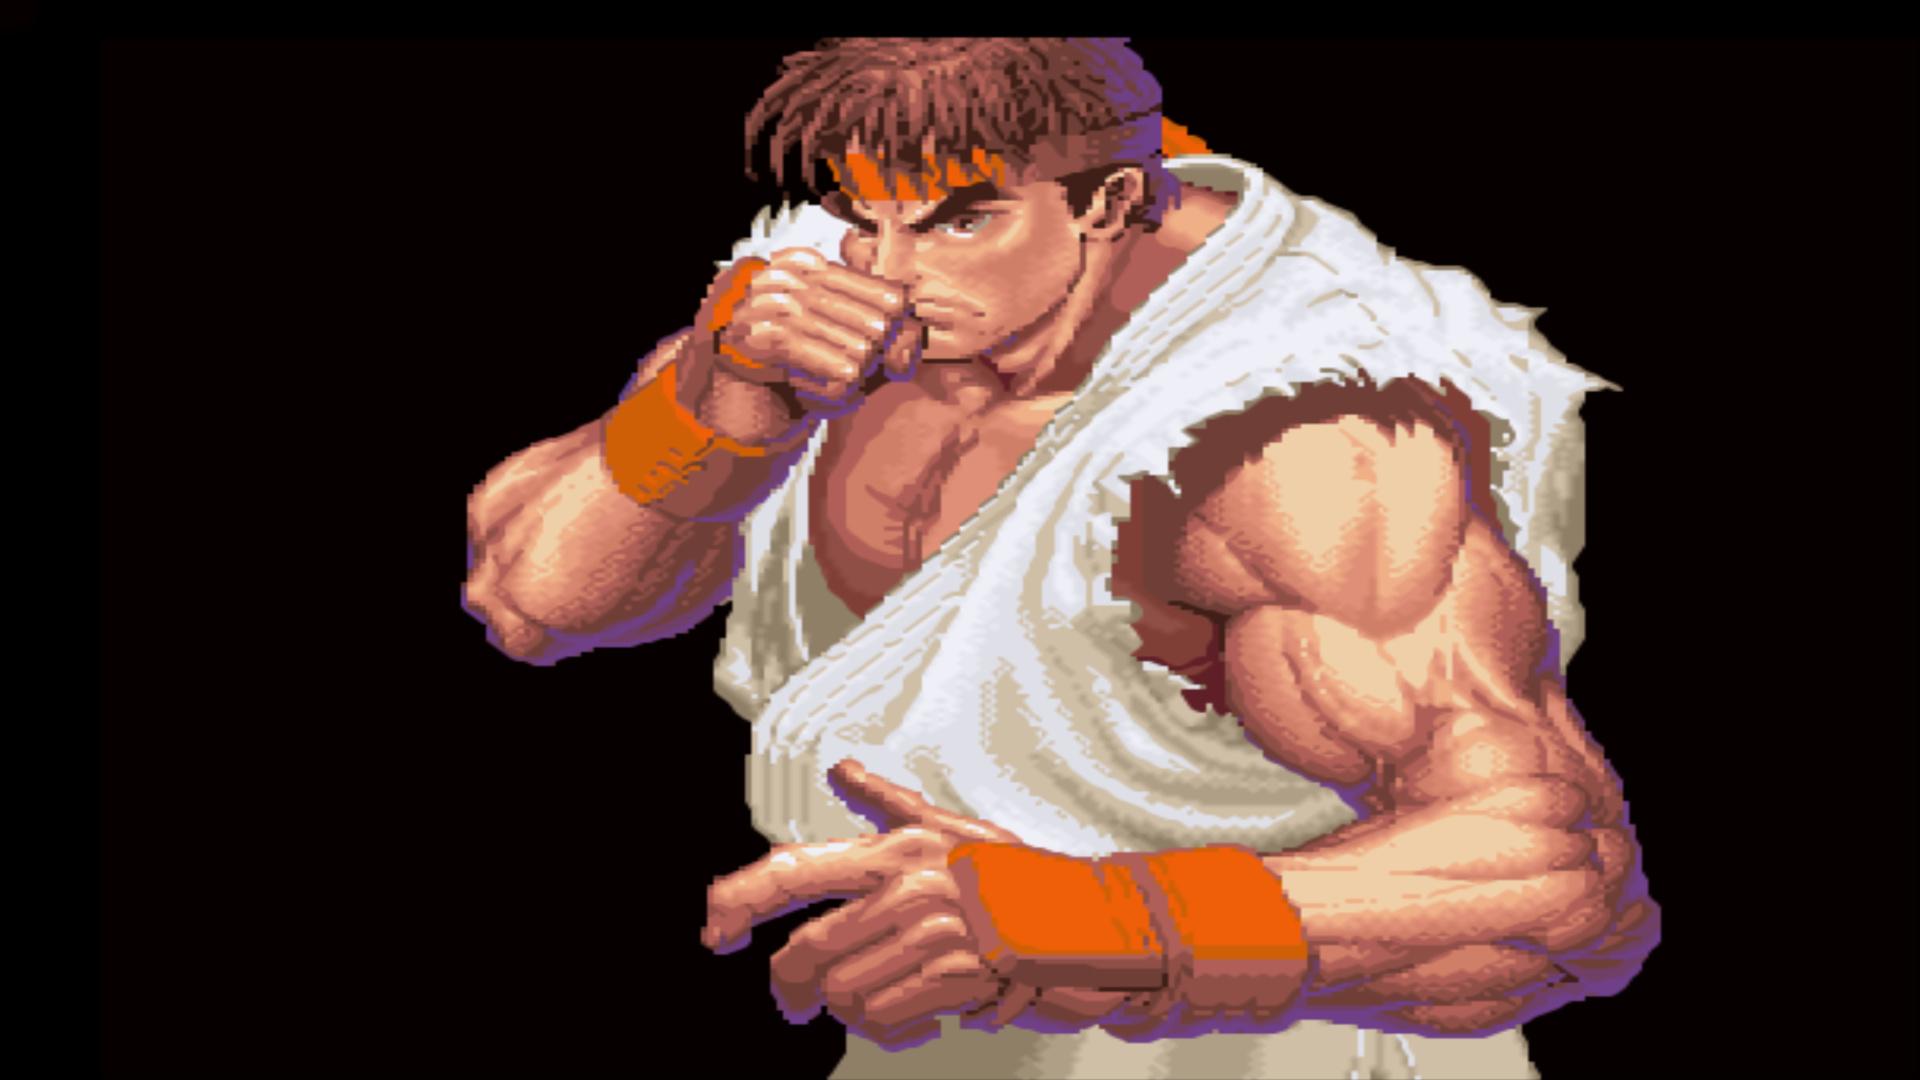 Super Street Fighter 2 (2).jpg - -